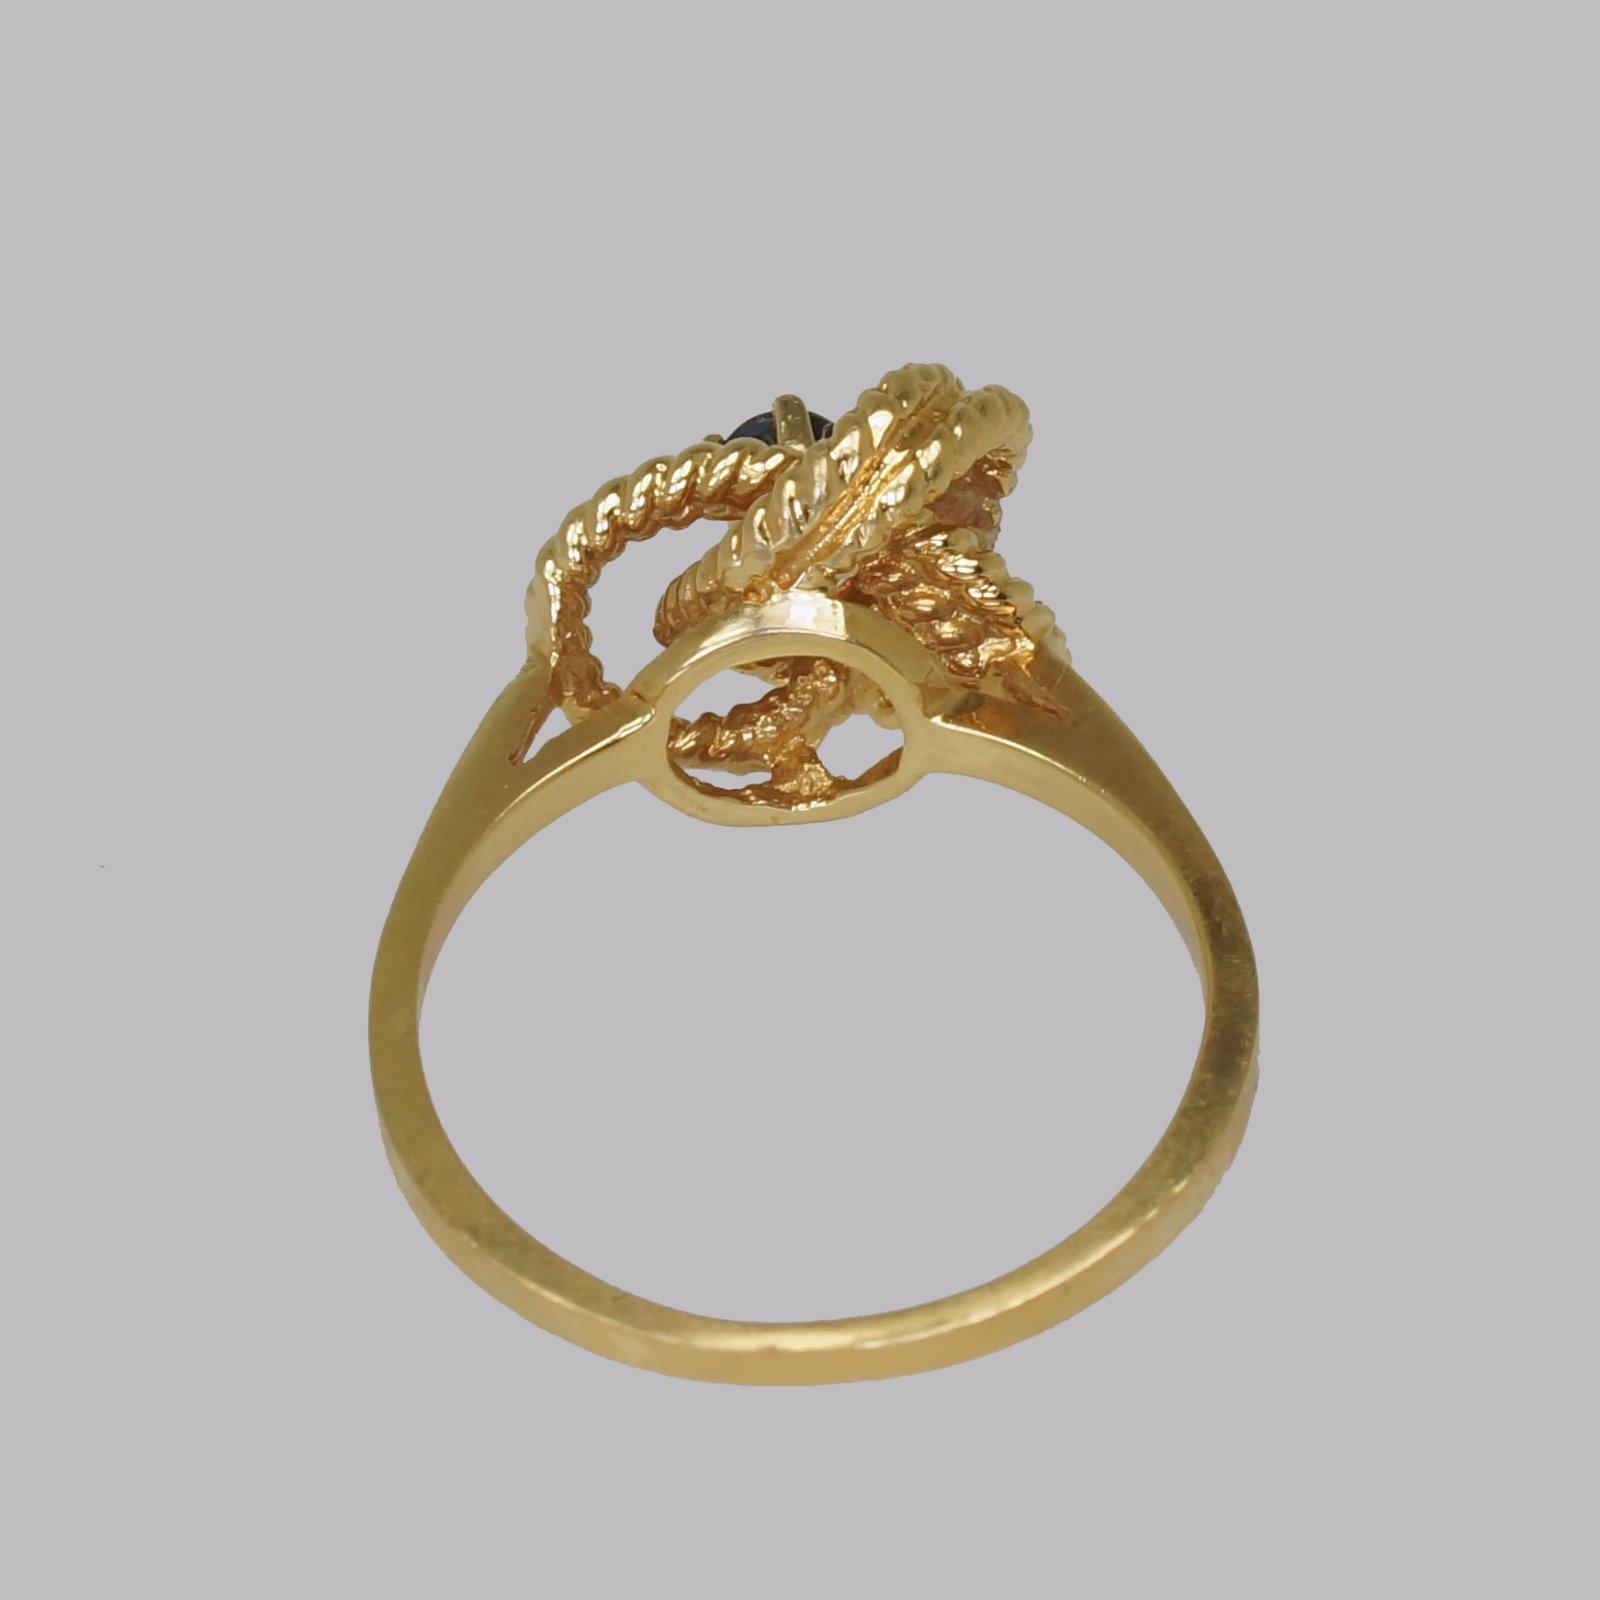 Vintage Tiffany Co 18ct Gold Blue Sapphire Ring Rare Tiffany Woven Knot Ring 1950 La177083 Loveantiques Com